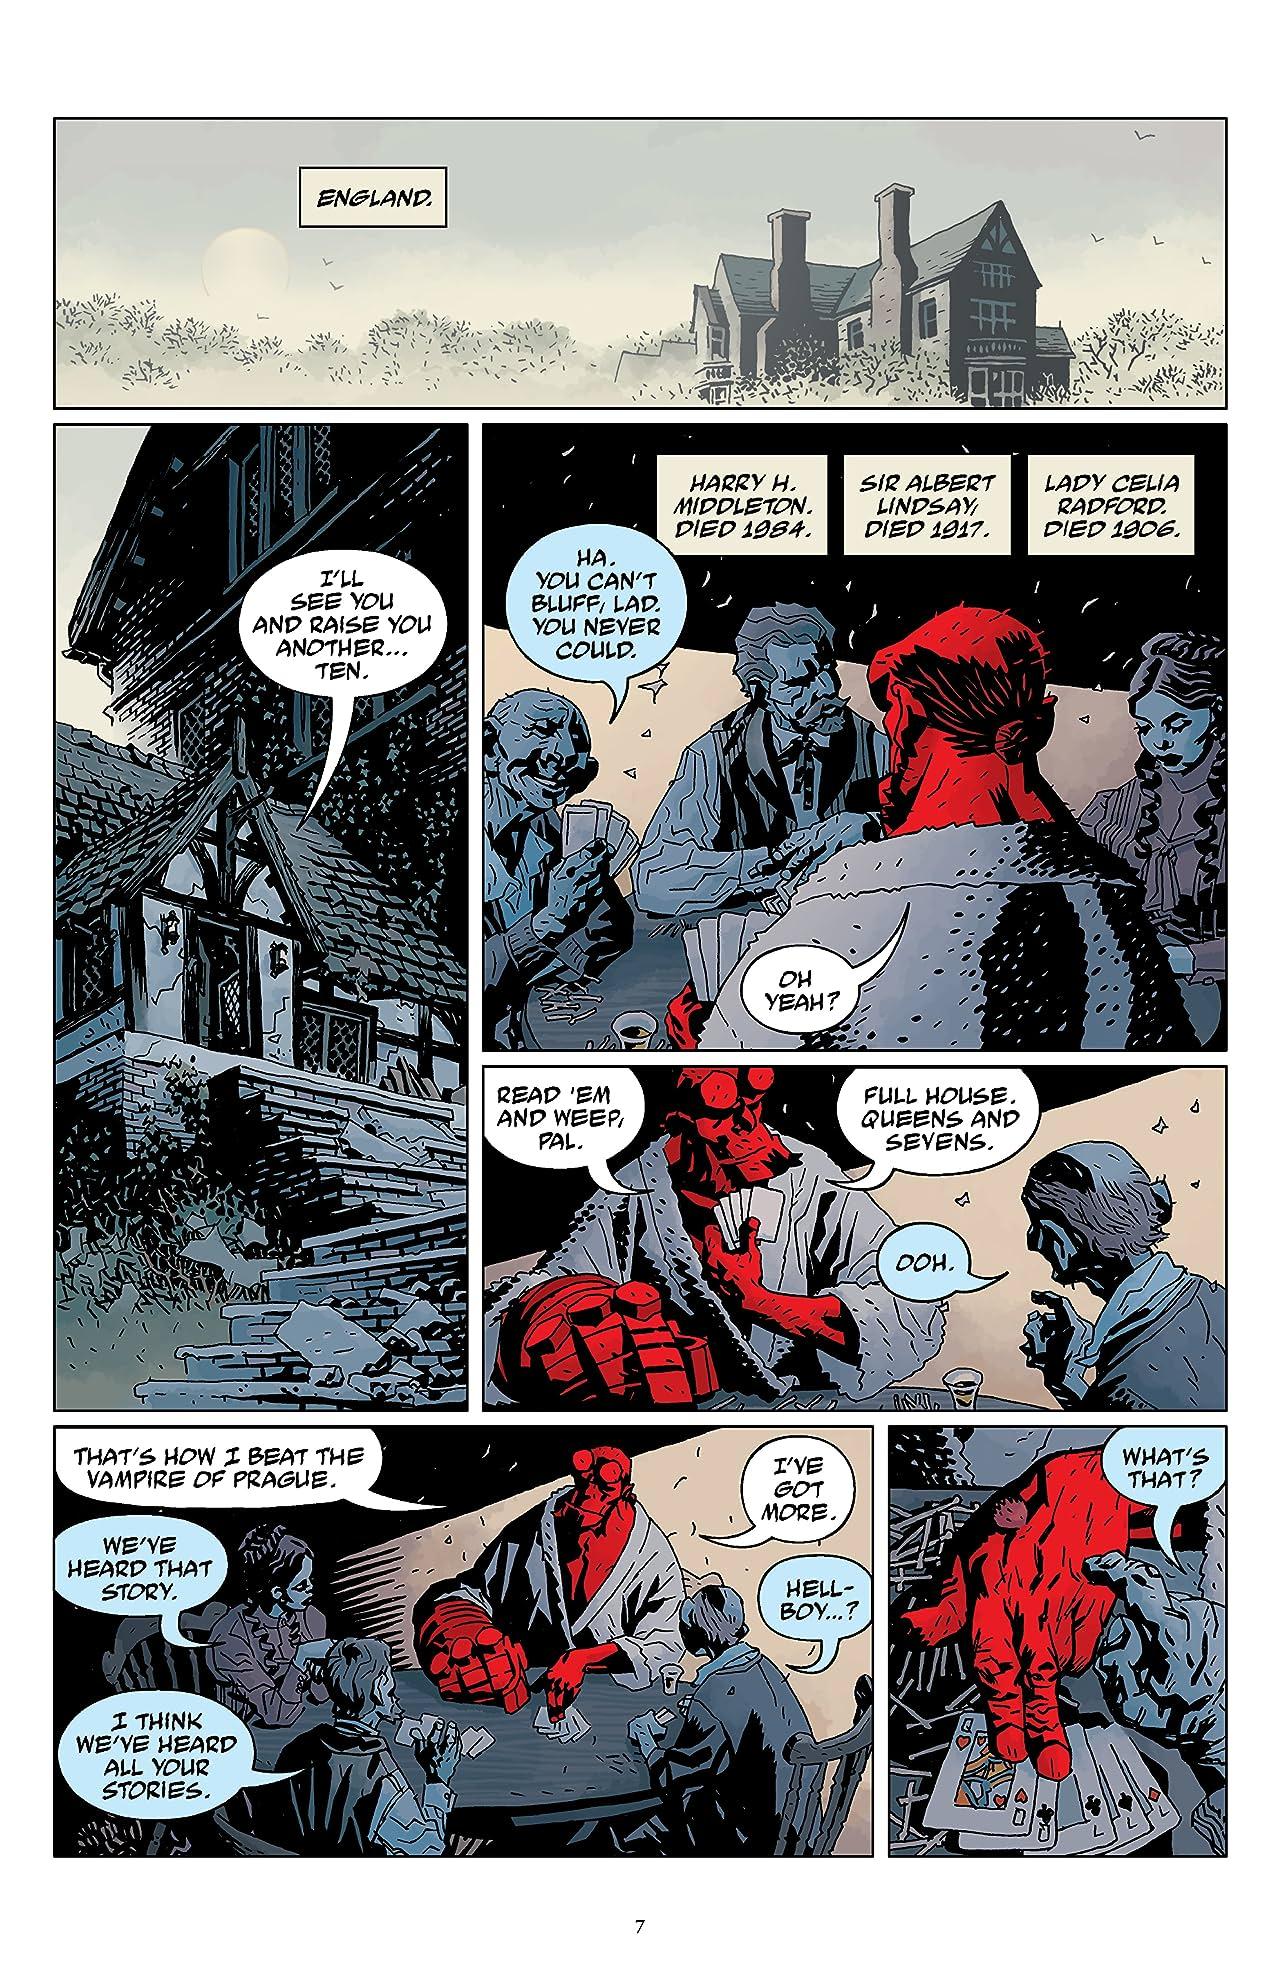 Hellboy Omnibus Vol. 3: The Wild Hunt